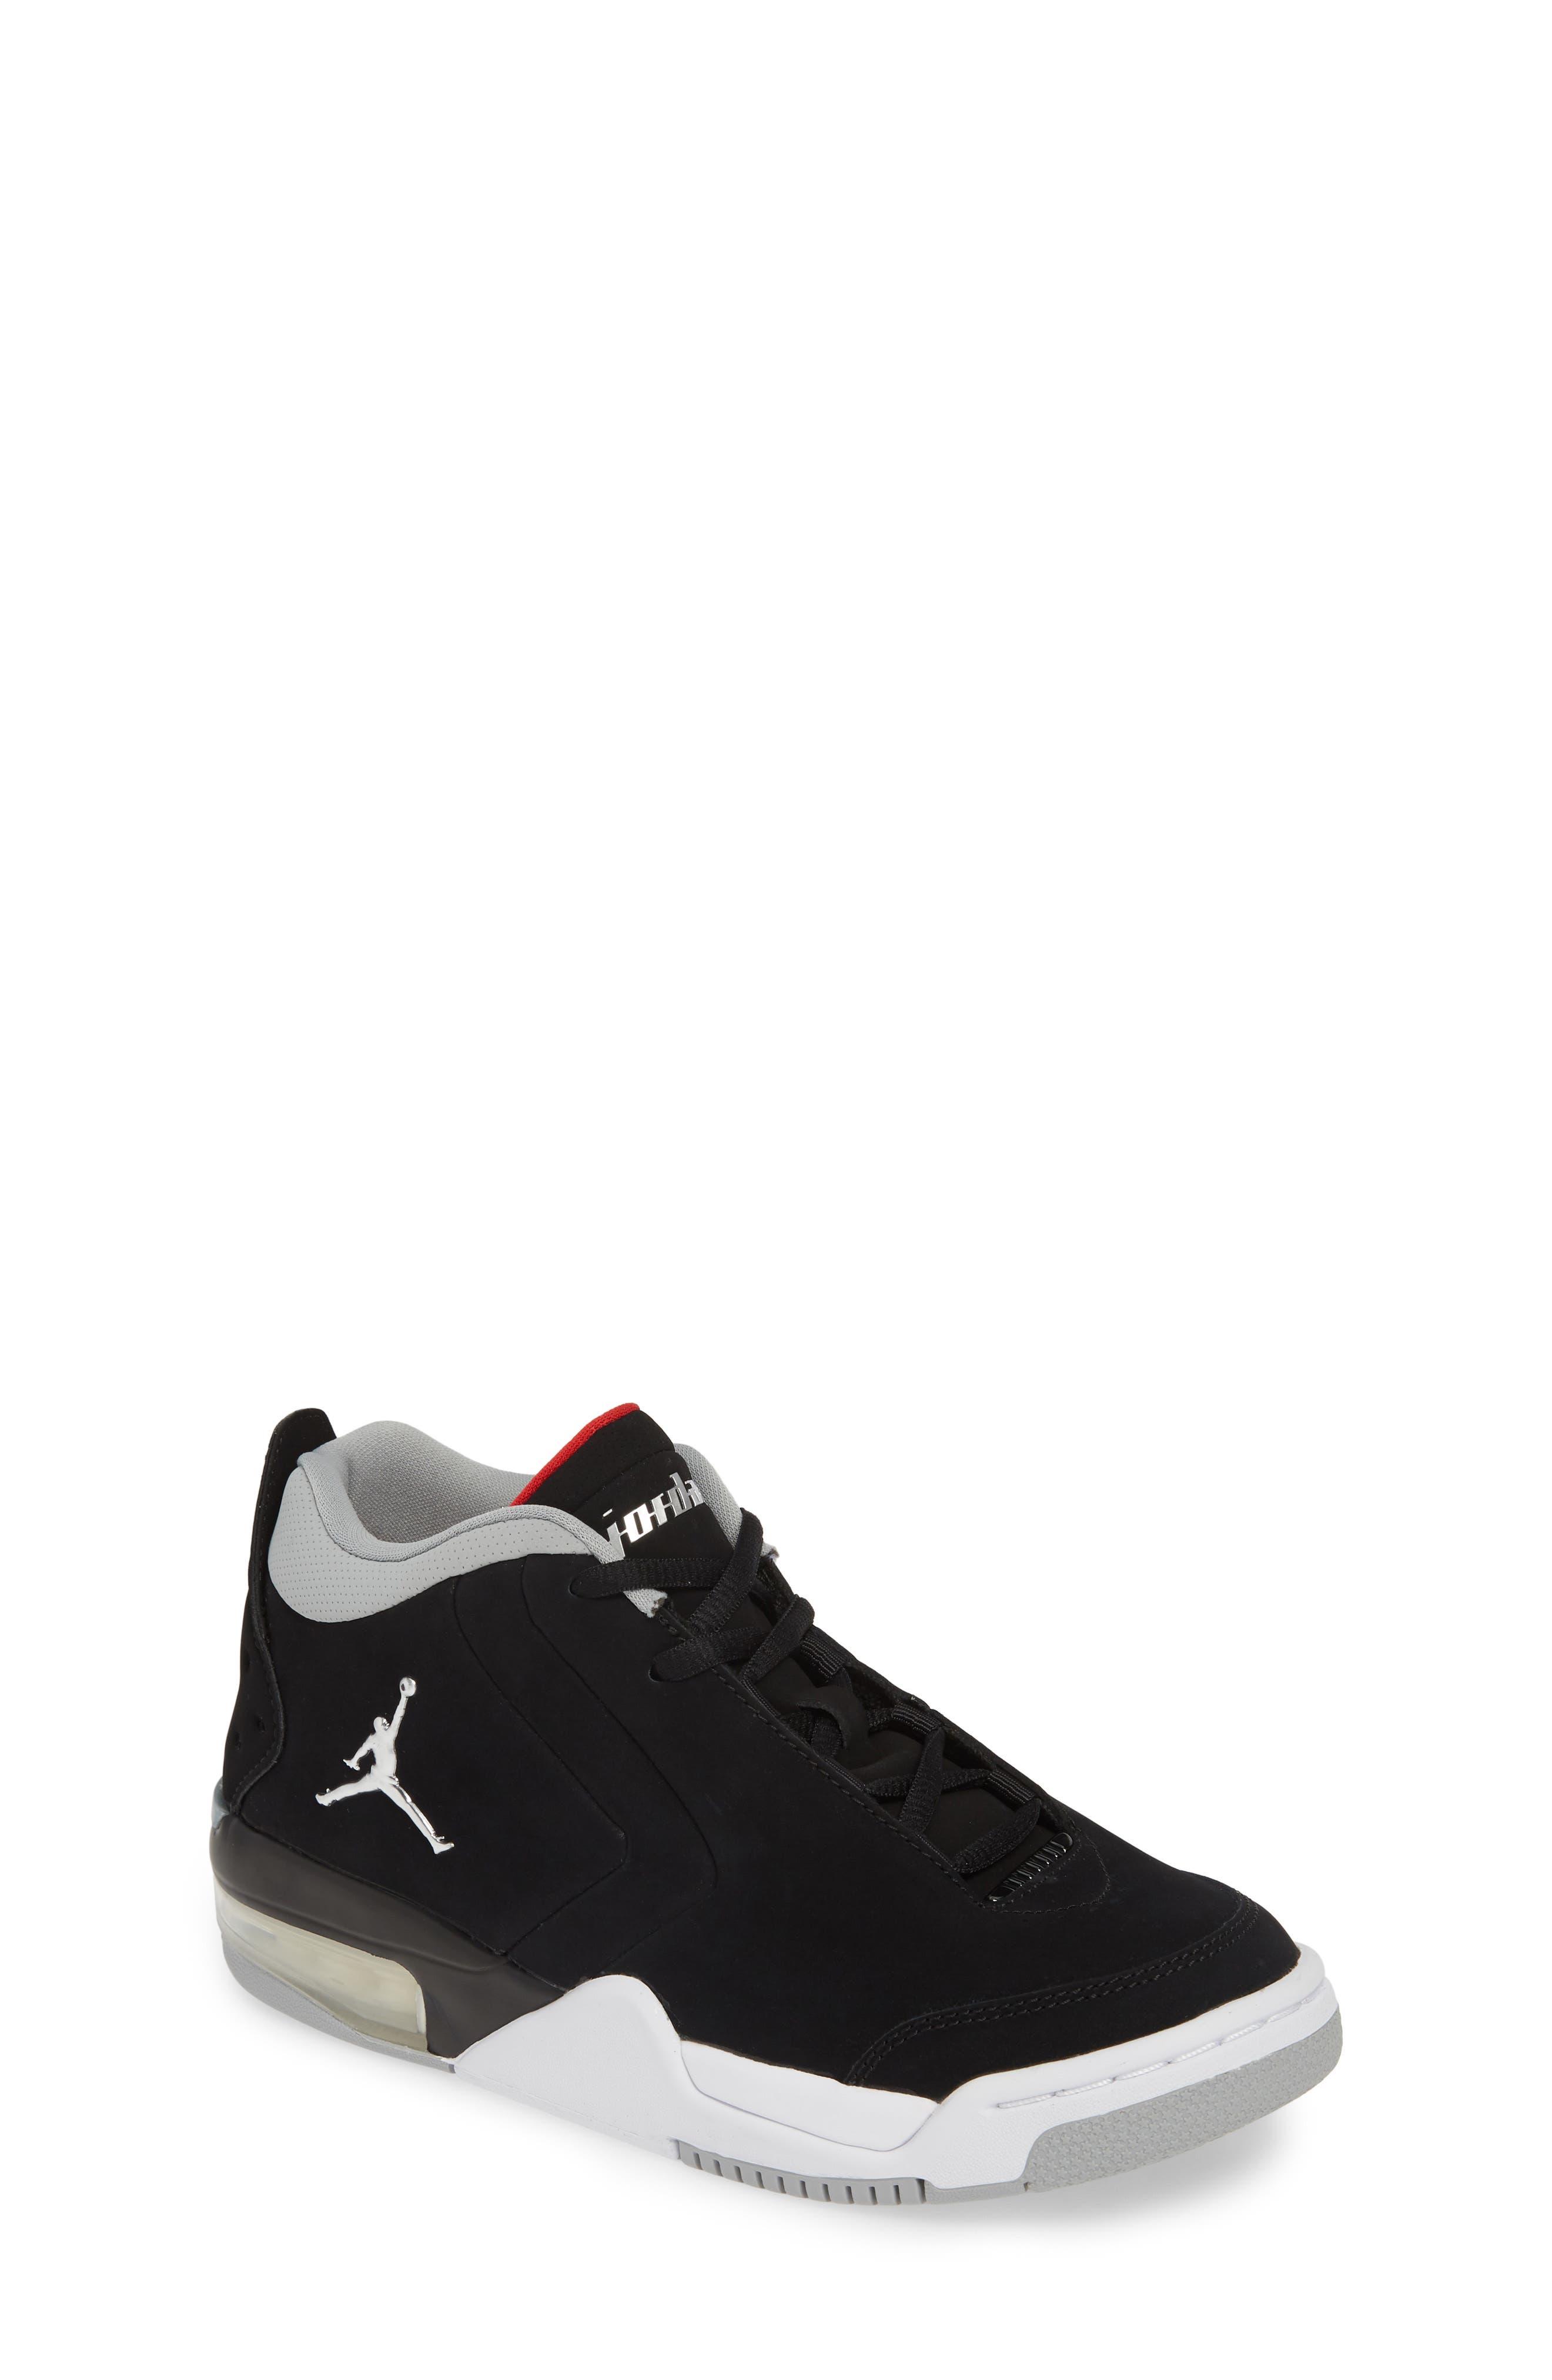 JORDAN, Big Fund Mid Top Basketball Sneaker, Main thumbnail 1, color, BLACK/ METALLIC SILVER-WHITE